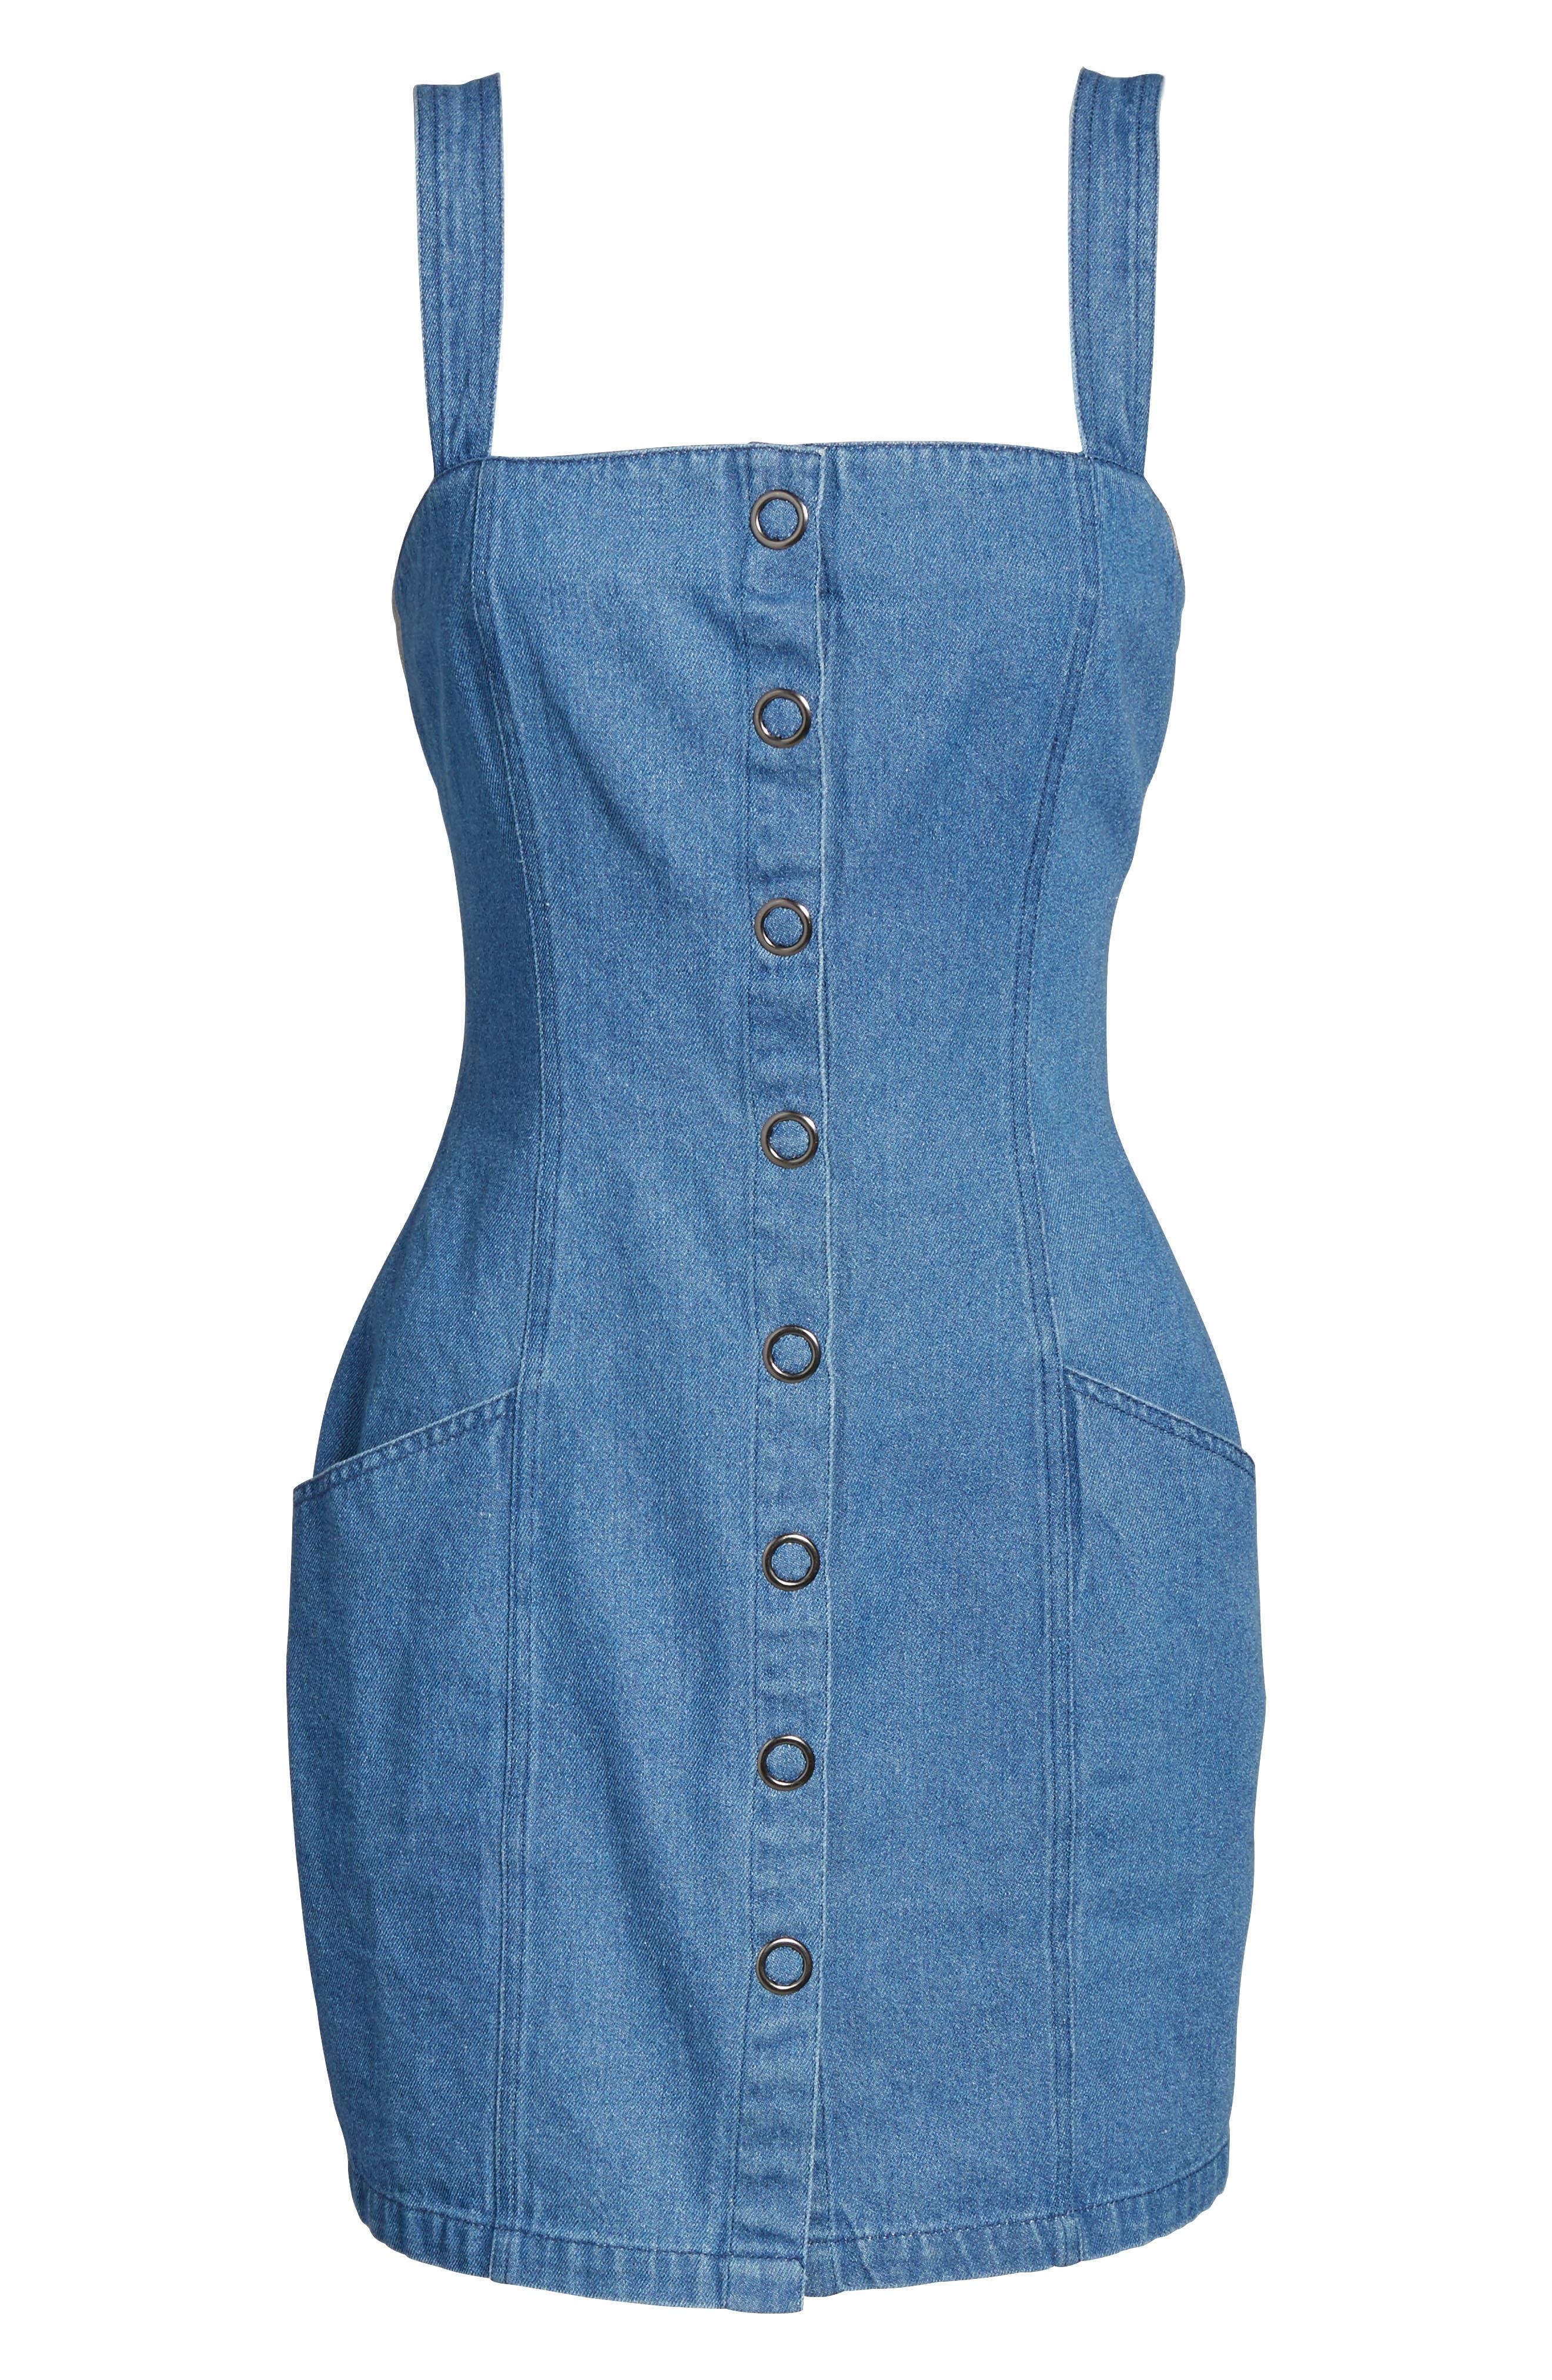 Vagabond Denim Dress,                             Alternate thumbnail 6, color,                             400